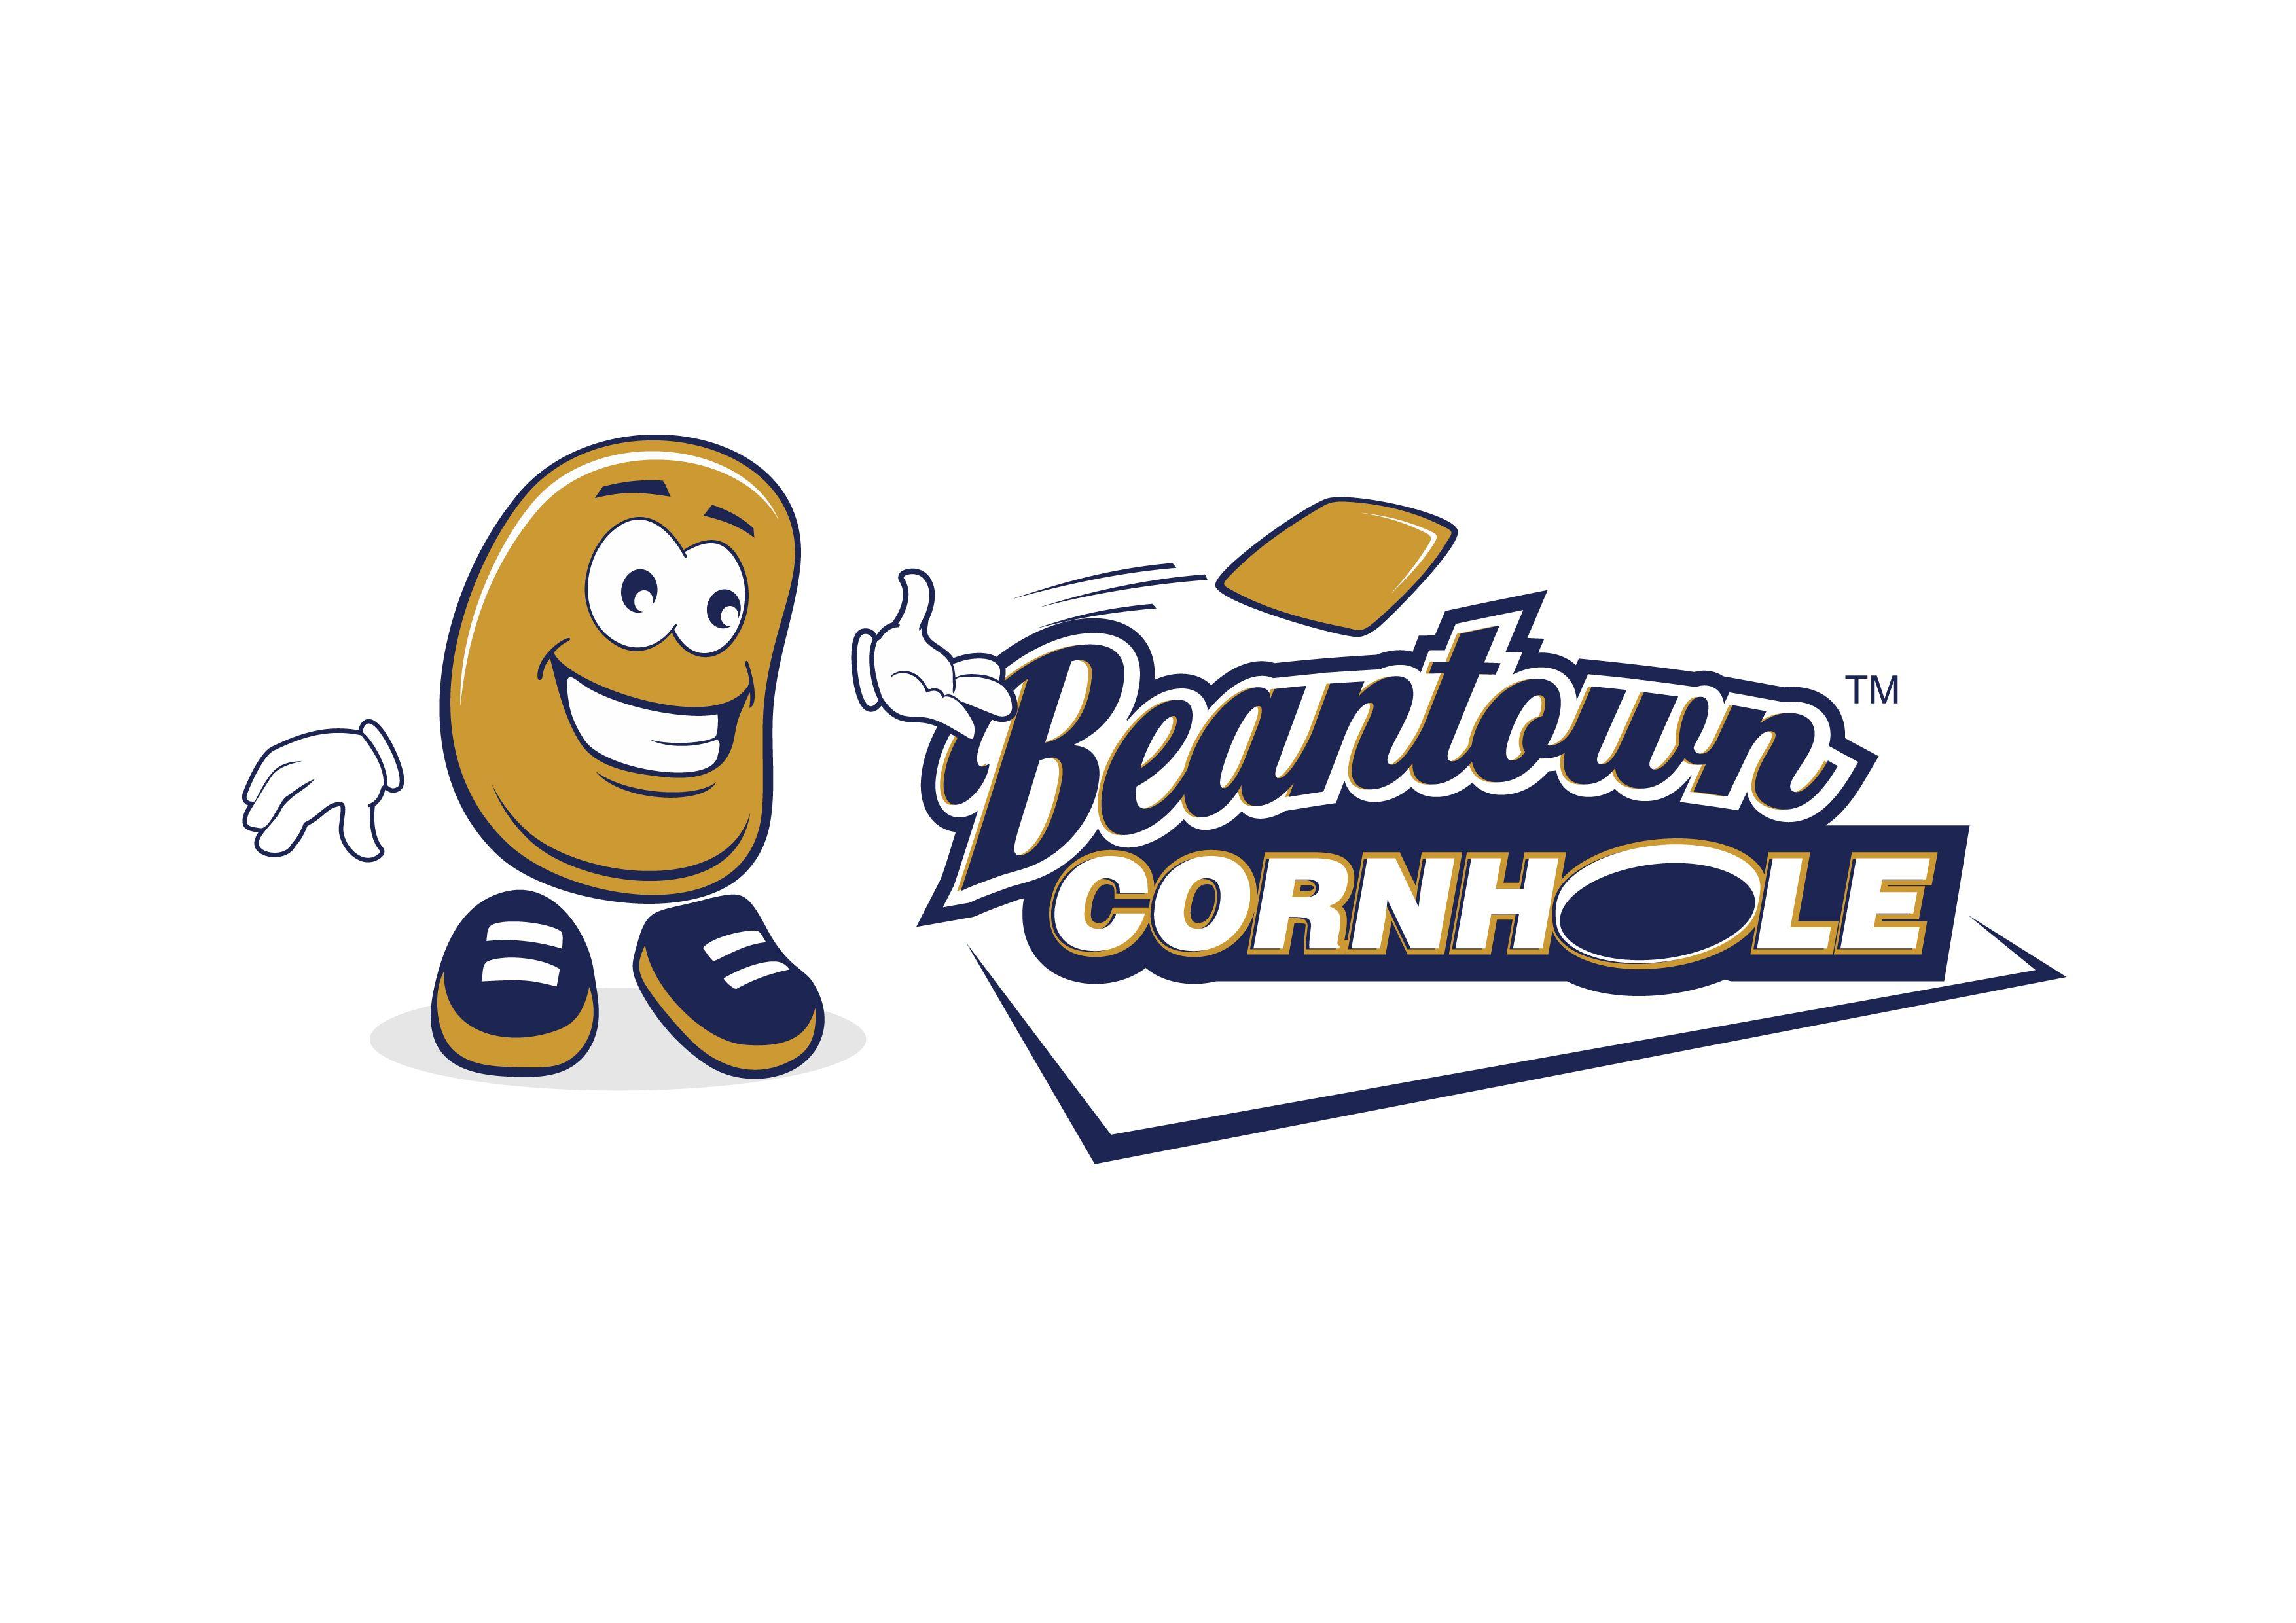 Beantown Cornhole - New England's 1st Cornhole Meetup Group